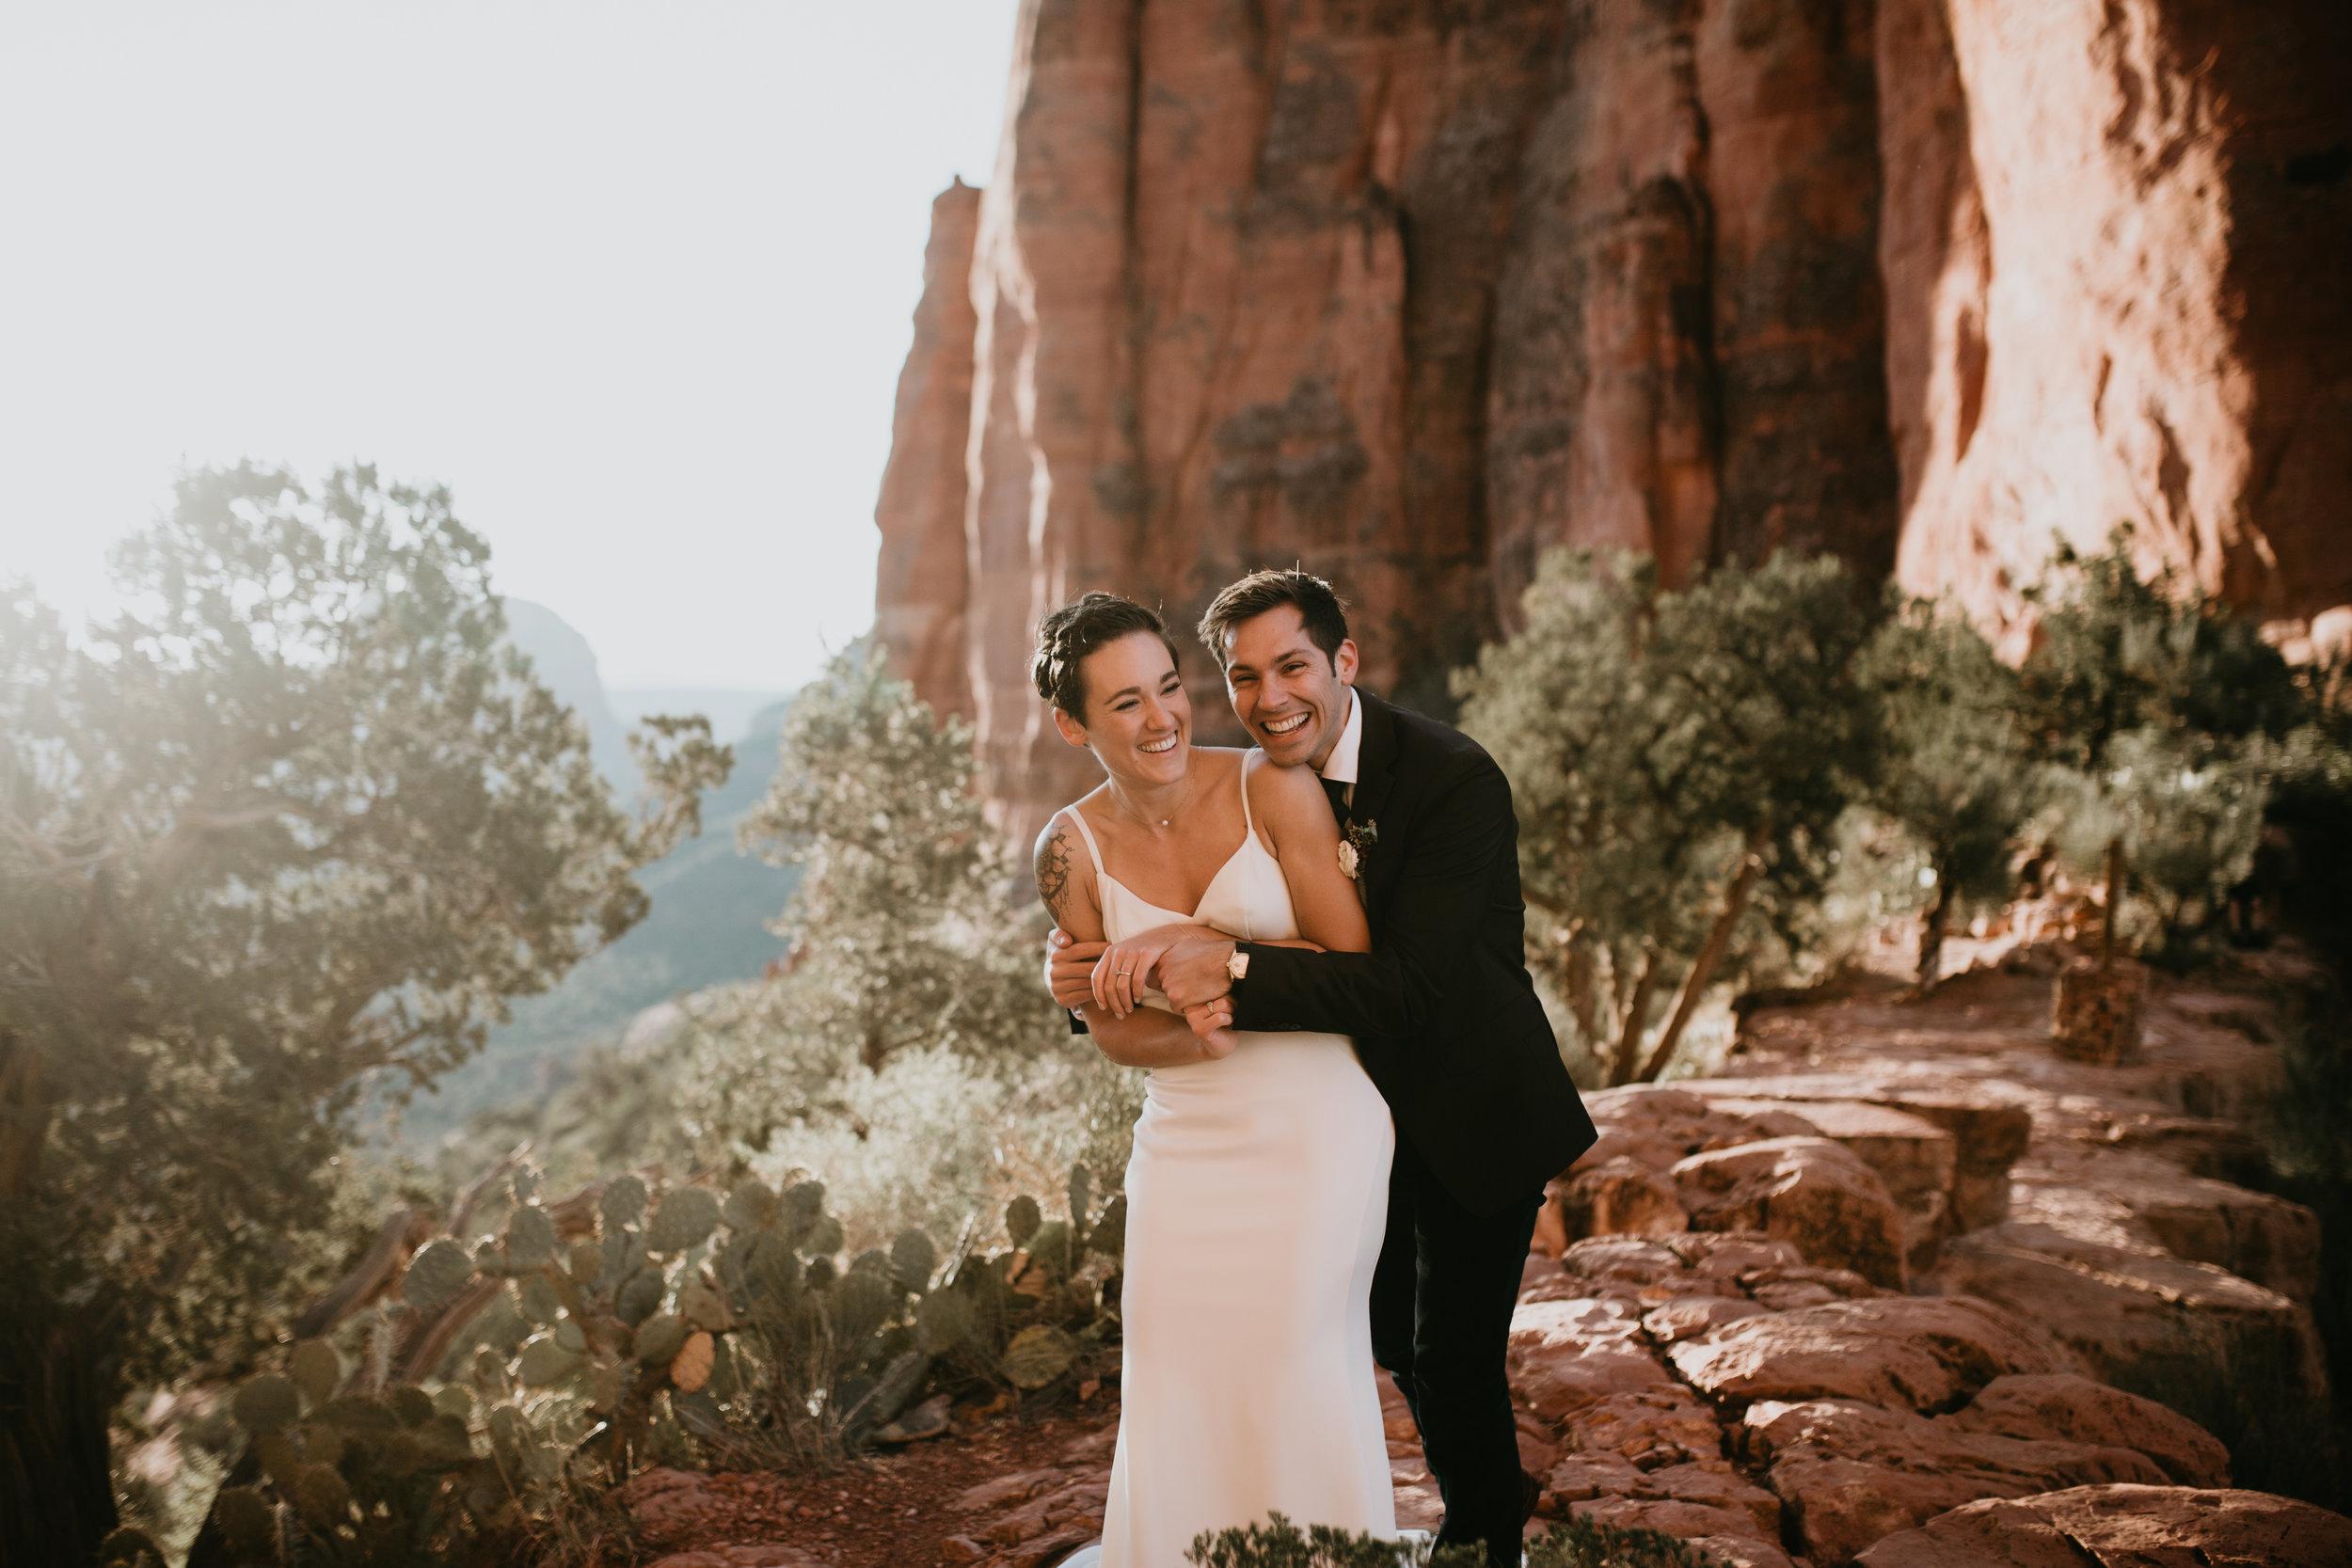 nicole-daacke-photography-sedona-arizona-destination-elopement-wedding-photographer-catherdral-rock-hiking-elopement-sedona-river-elopement-photos-desert-rock-wedding-photographer-laid-back-spontaneous-elopement-51.jpg